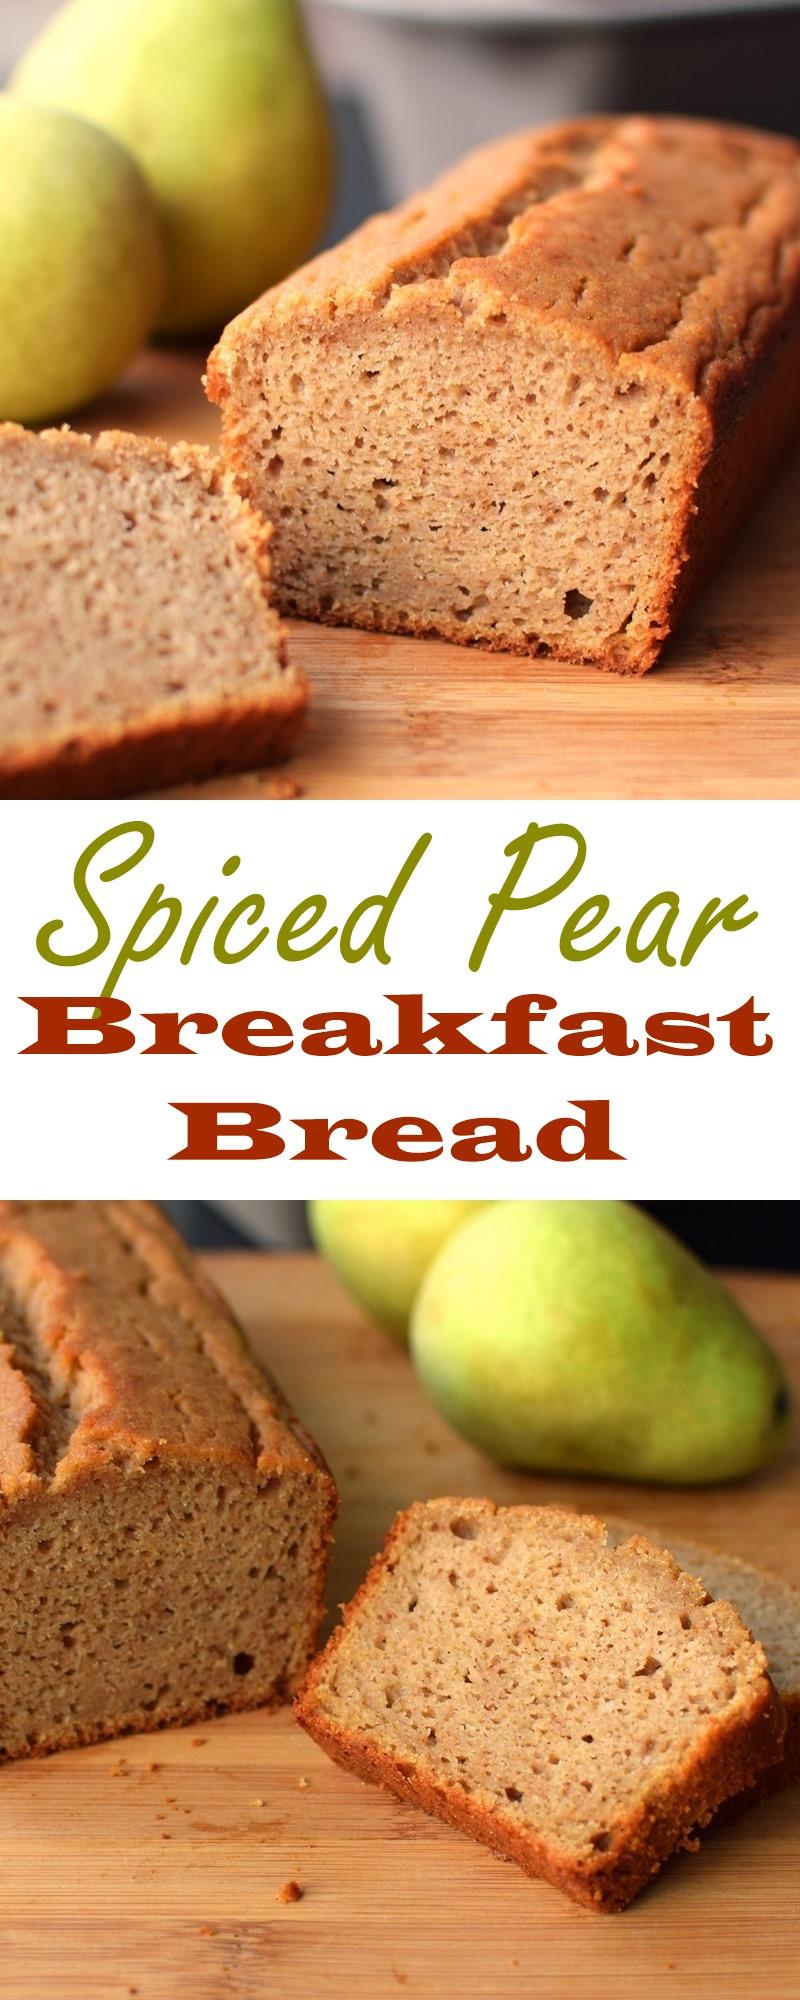 Spiced Pear Breakfast Bread Recipe: Healthy, dairy-free, nut-free, soy-free